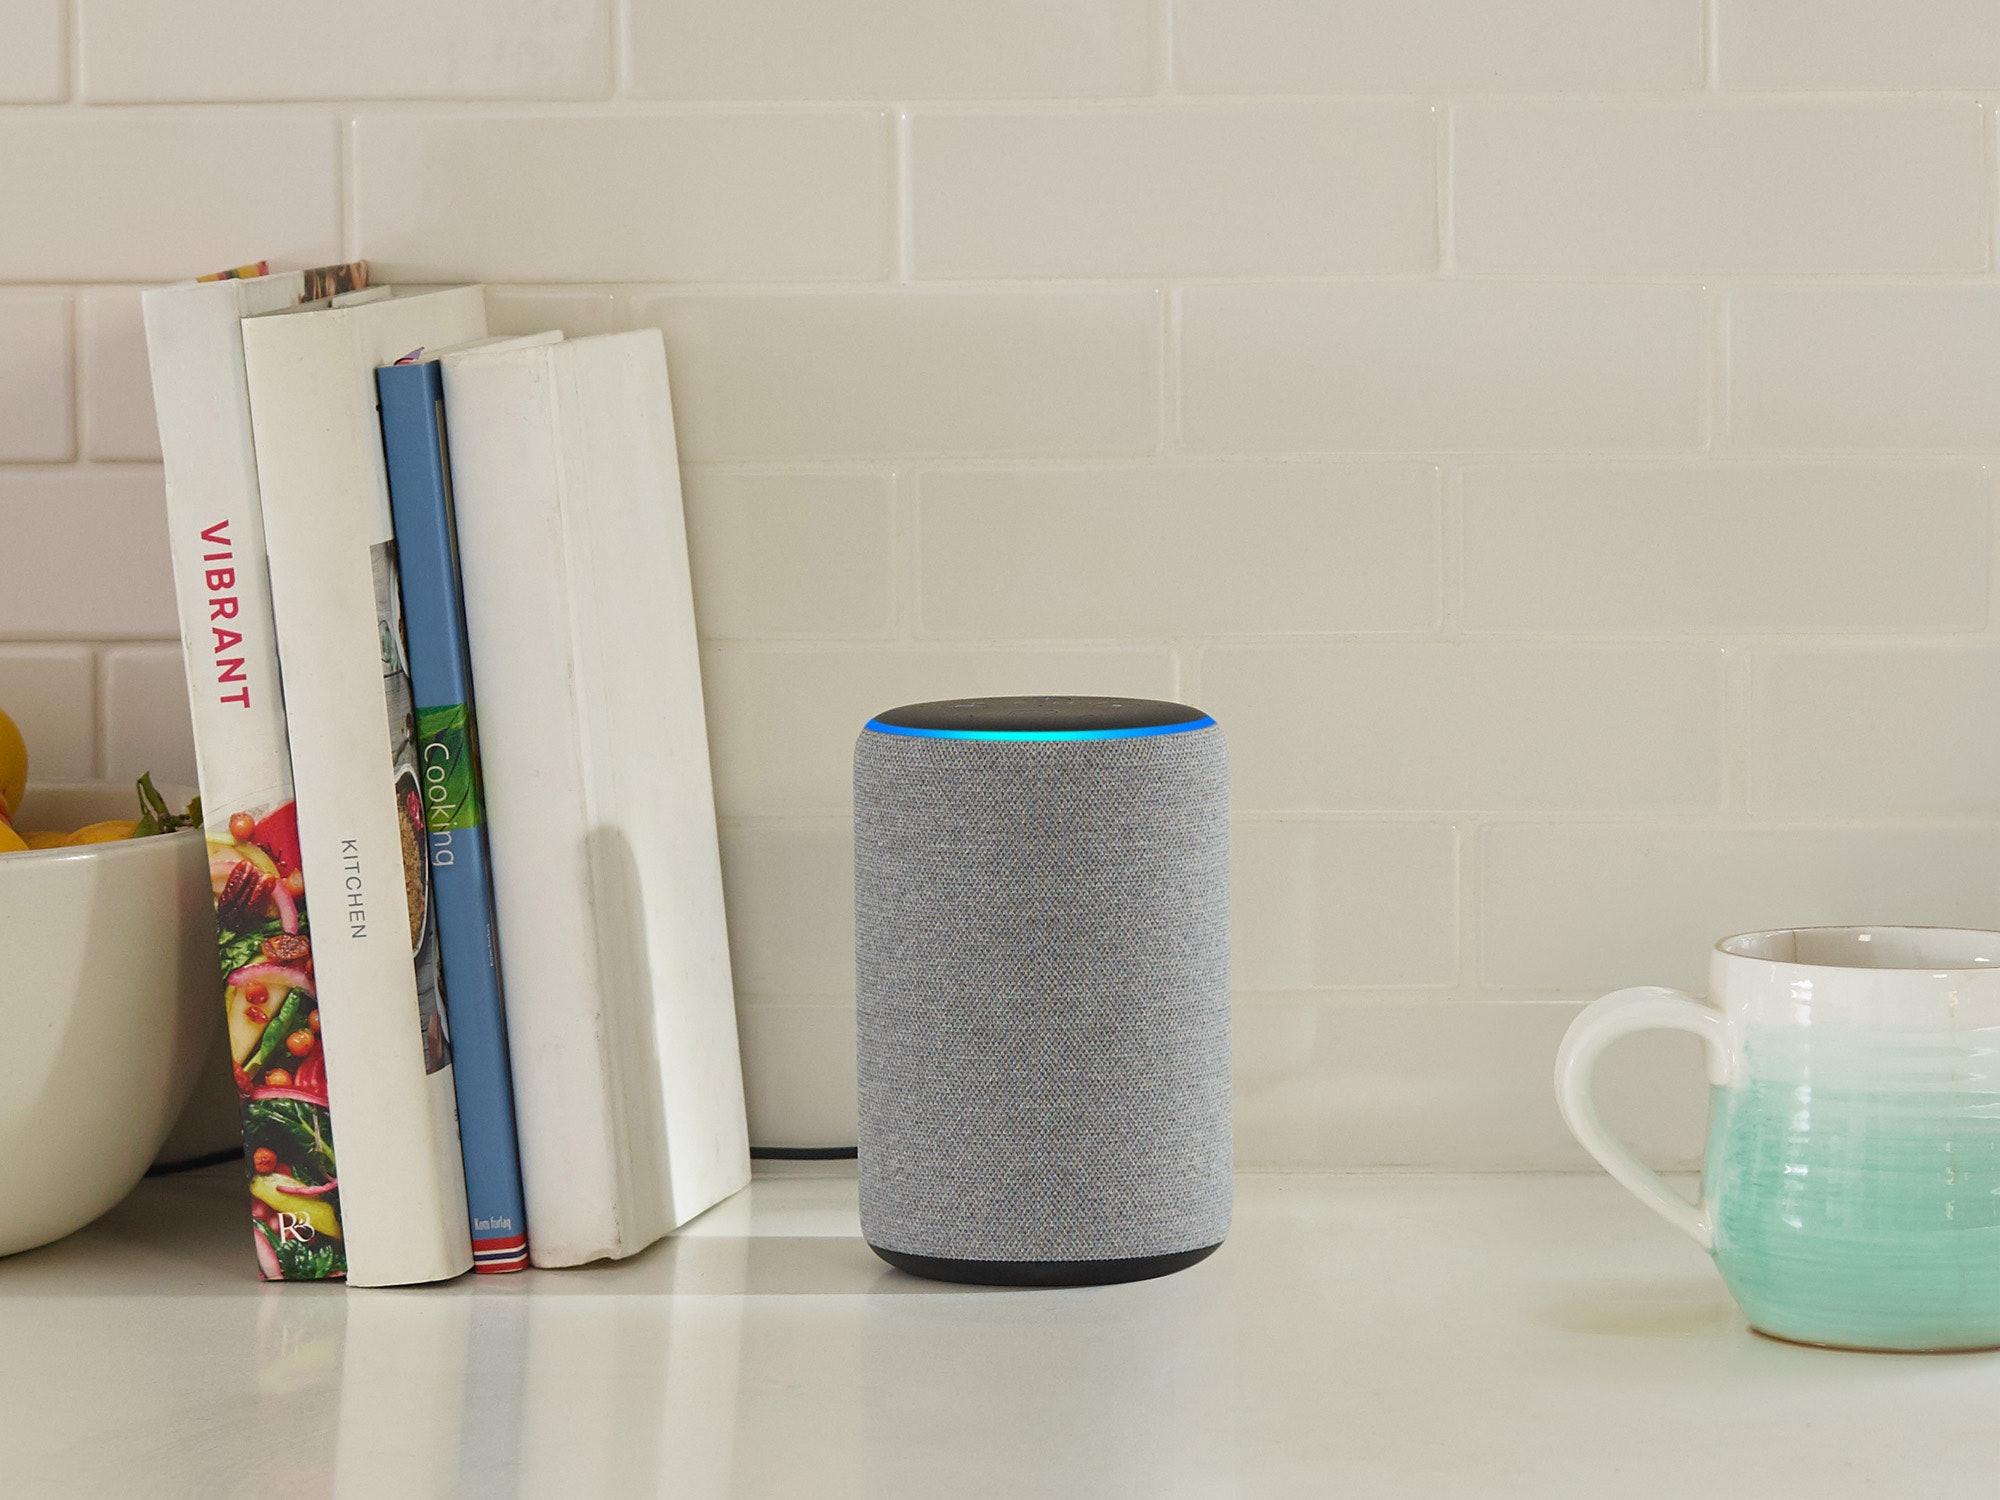 One hub to rule them all? Amazon Echo Plus.